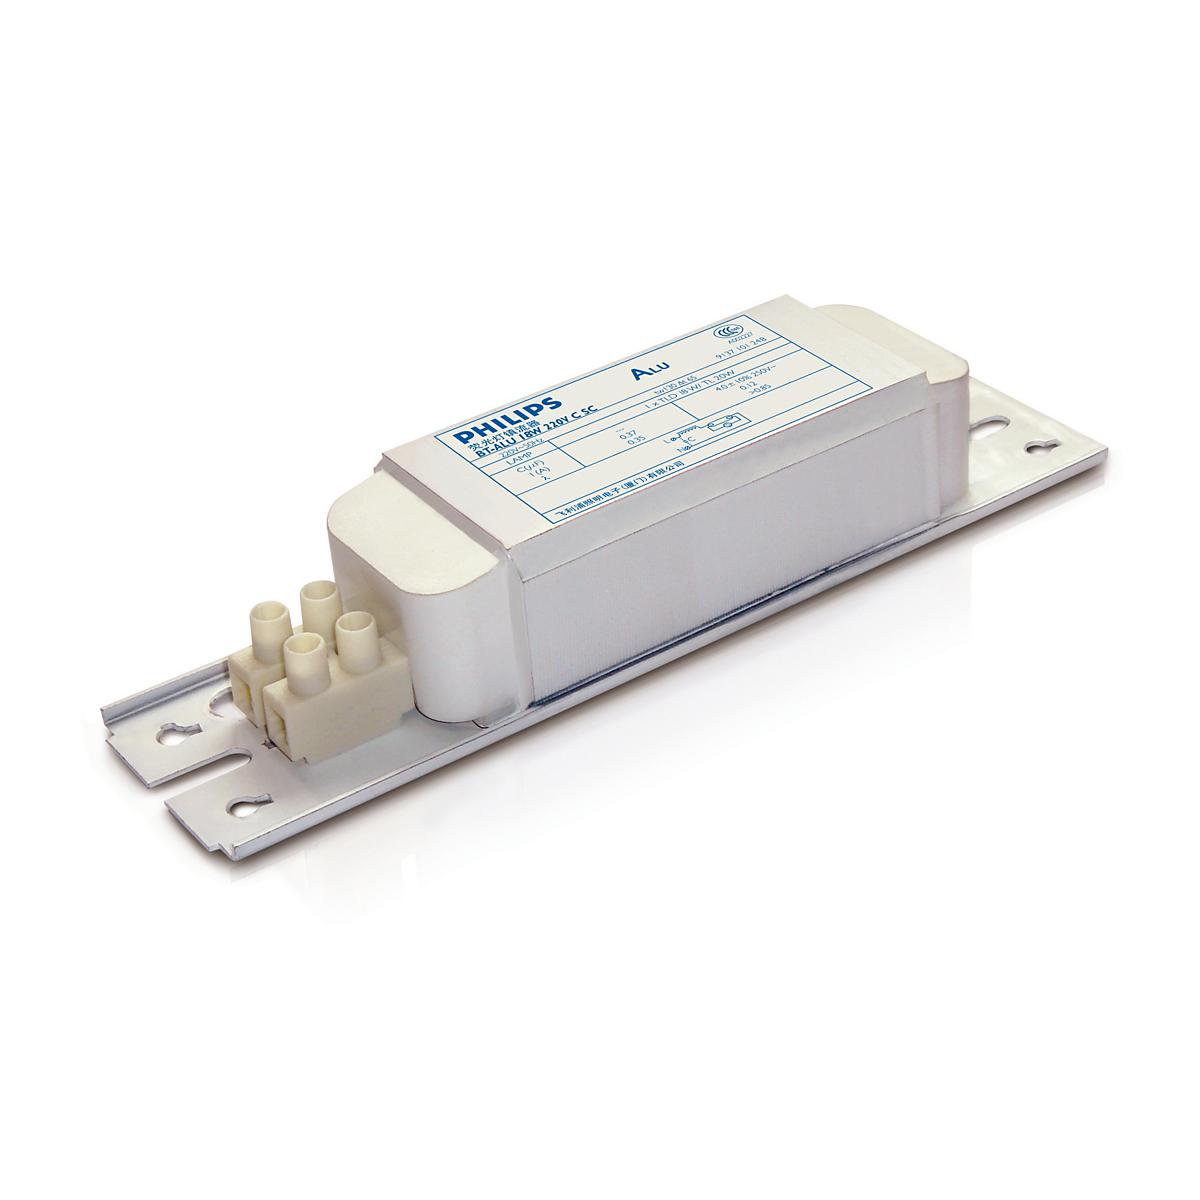 Bta Em Ballasts For Tl Fluorescent Lamps Electromagnetic Tube Light Wiring Diagram Pdf